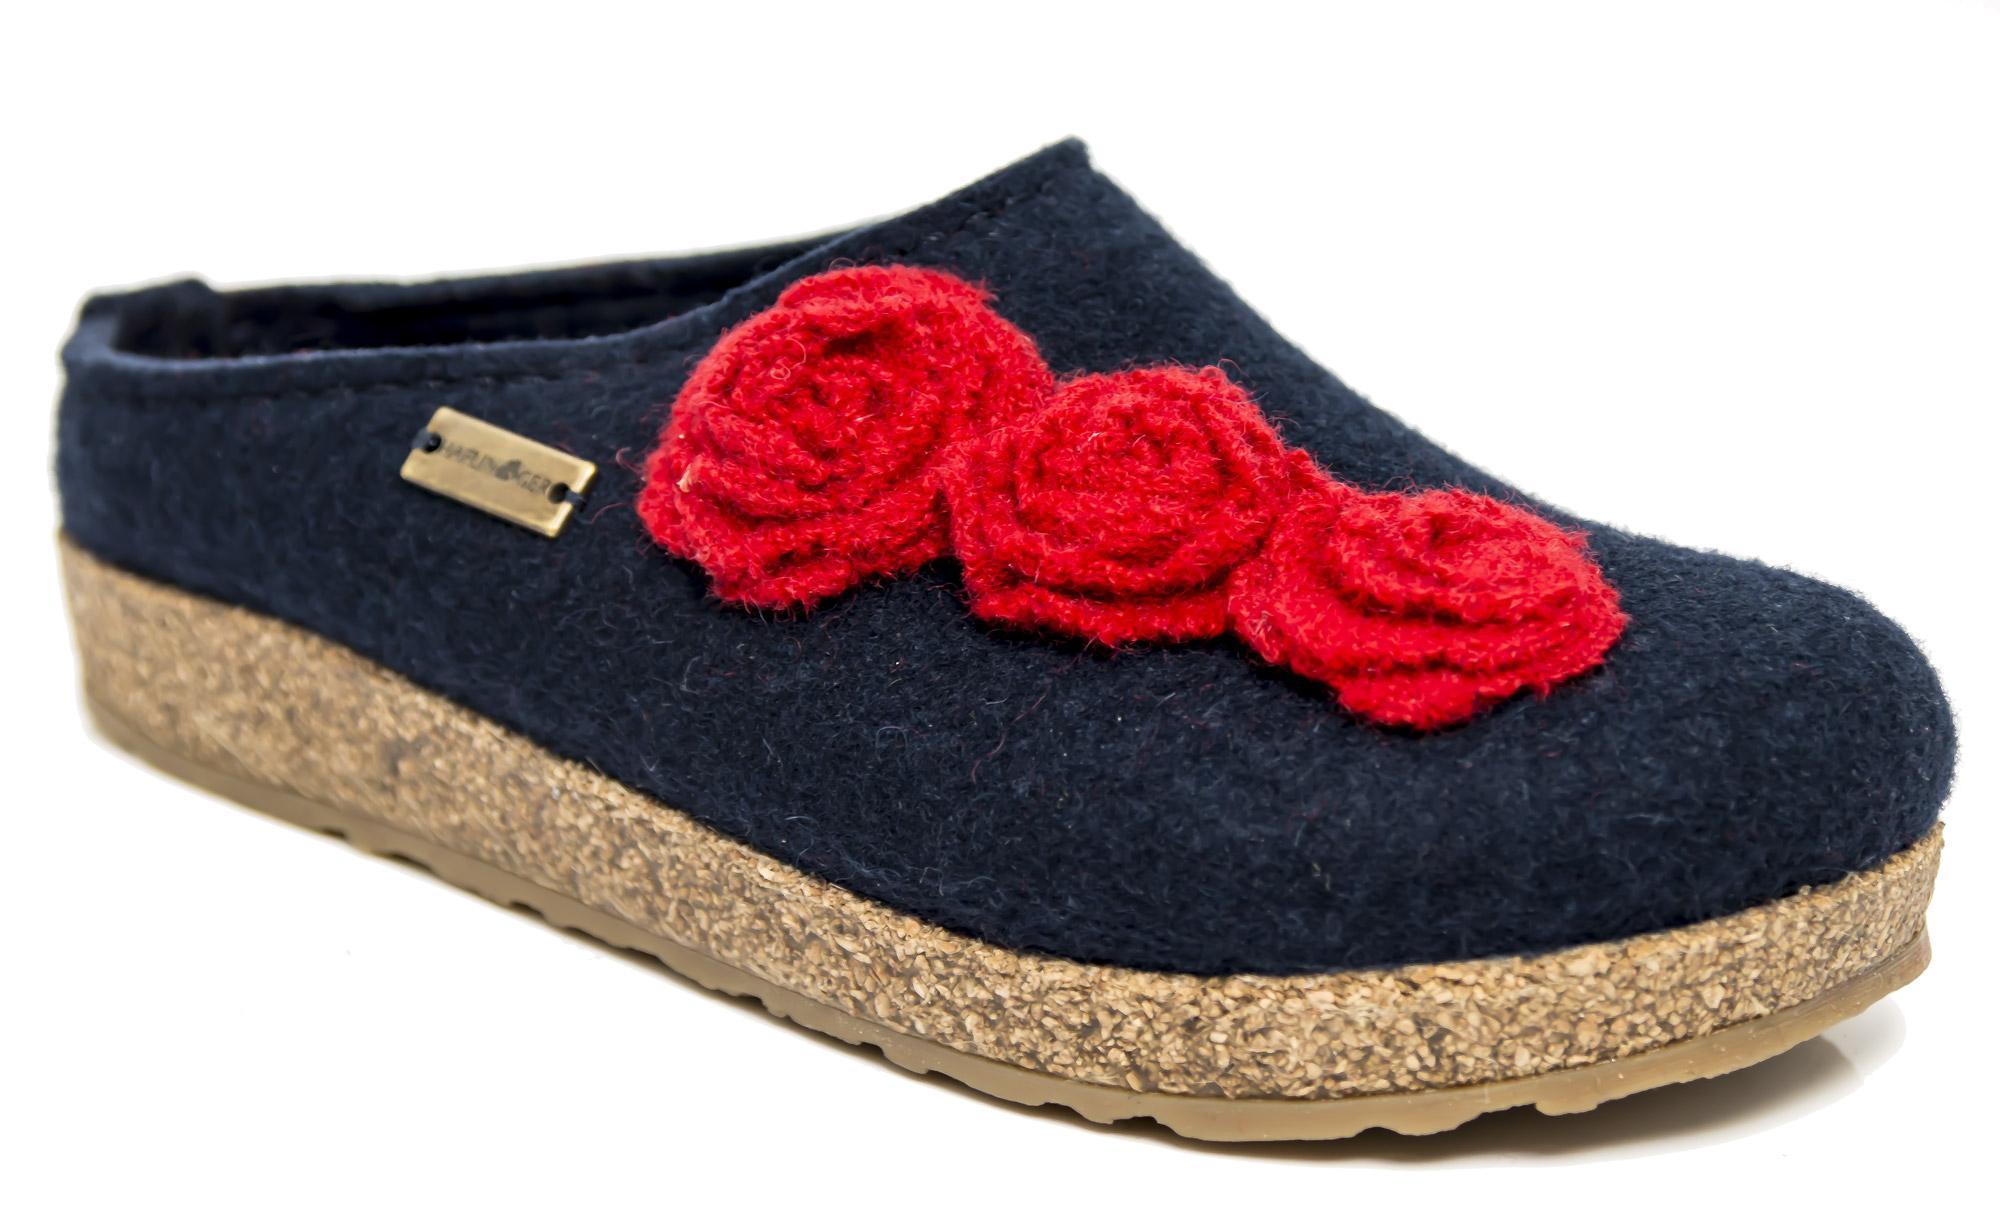 In 36 Pantofole Lana Rosalia Grizzly Blu Haflinger 73107207 Feltro qrg8rwUX7